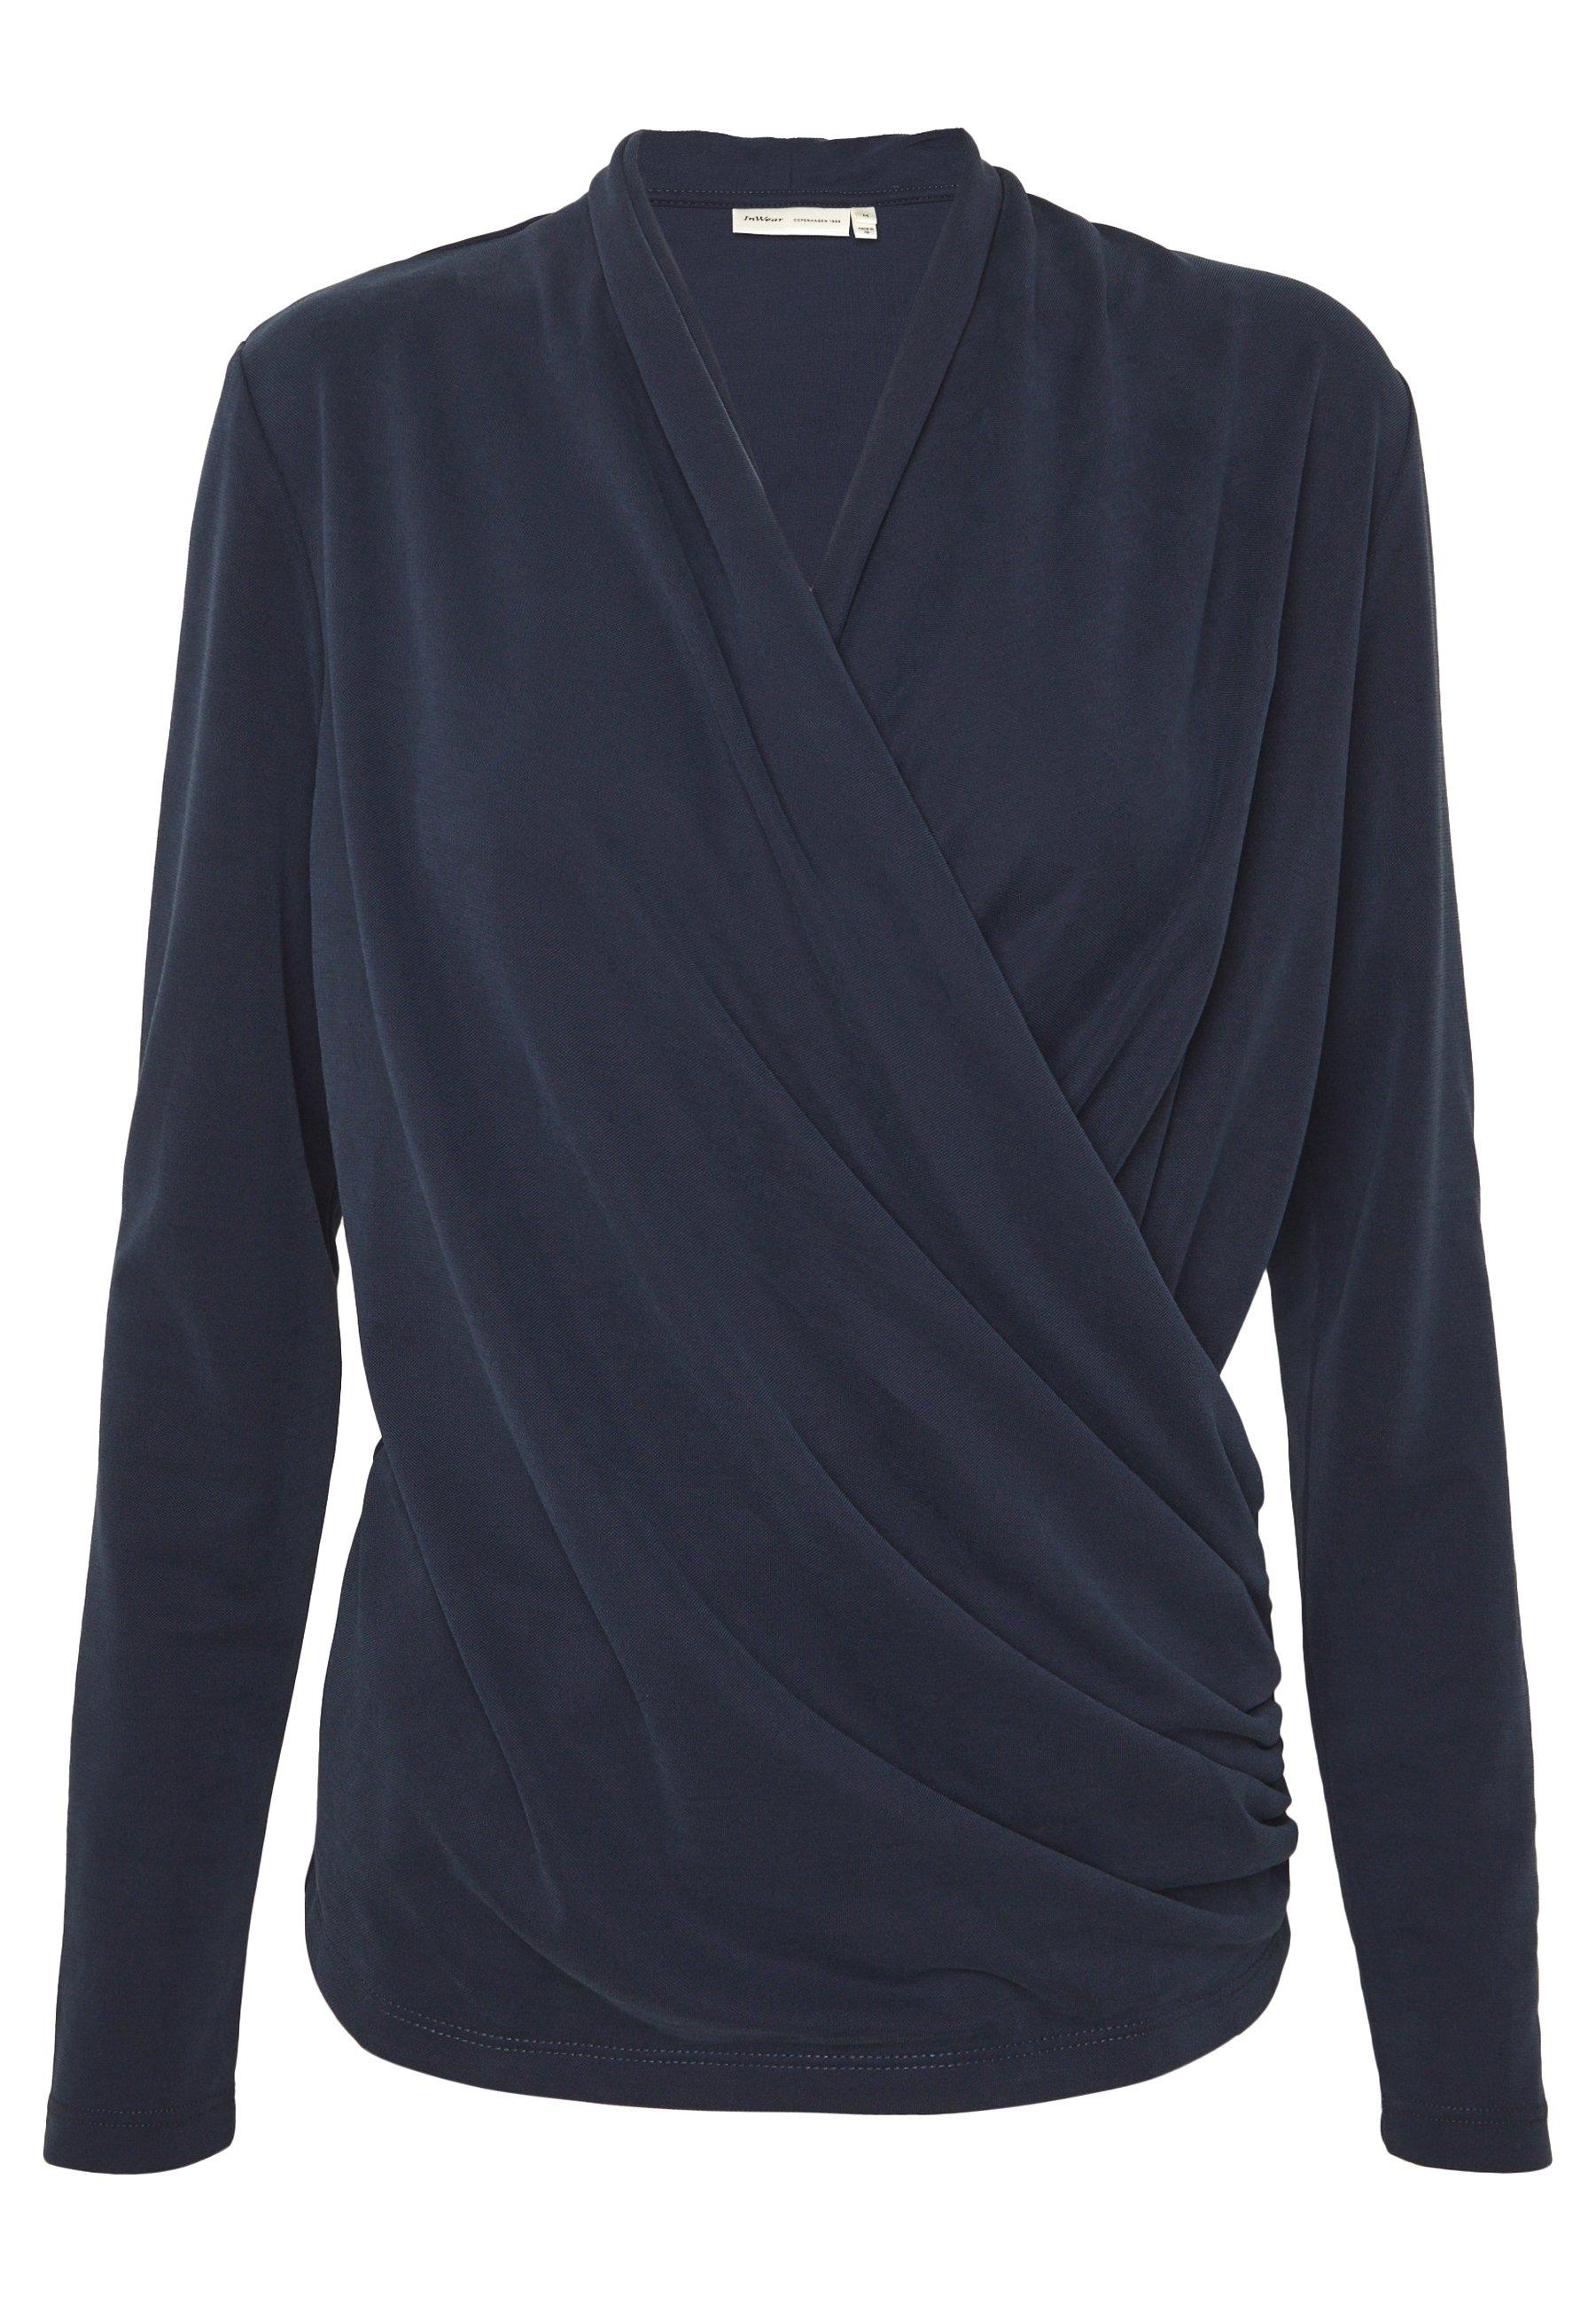 Beige AlanoIW Wrap Bluse  InWear  Bluser - Dameklær er billig